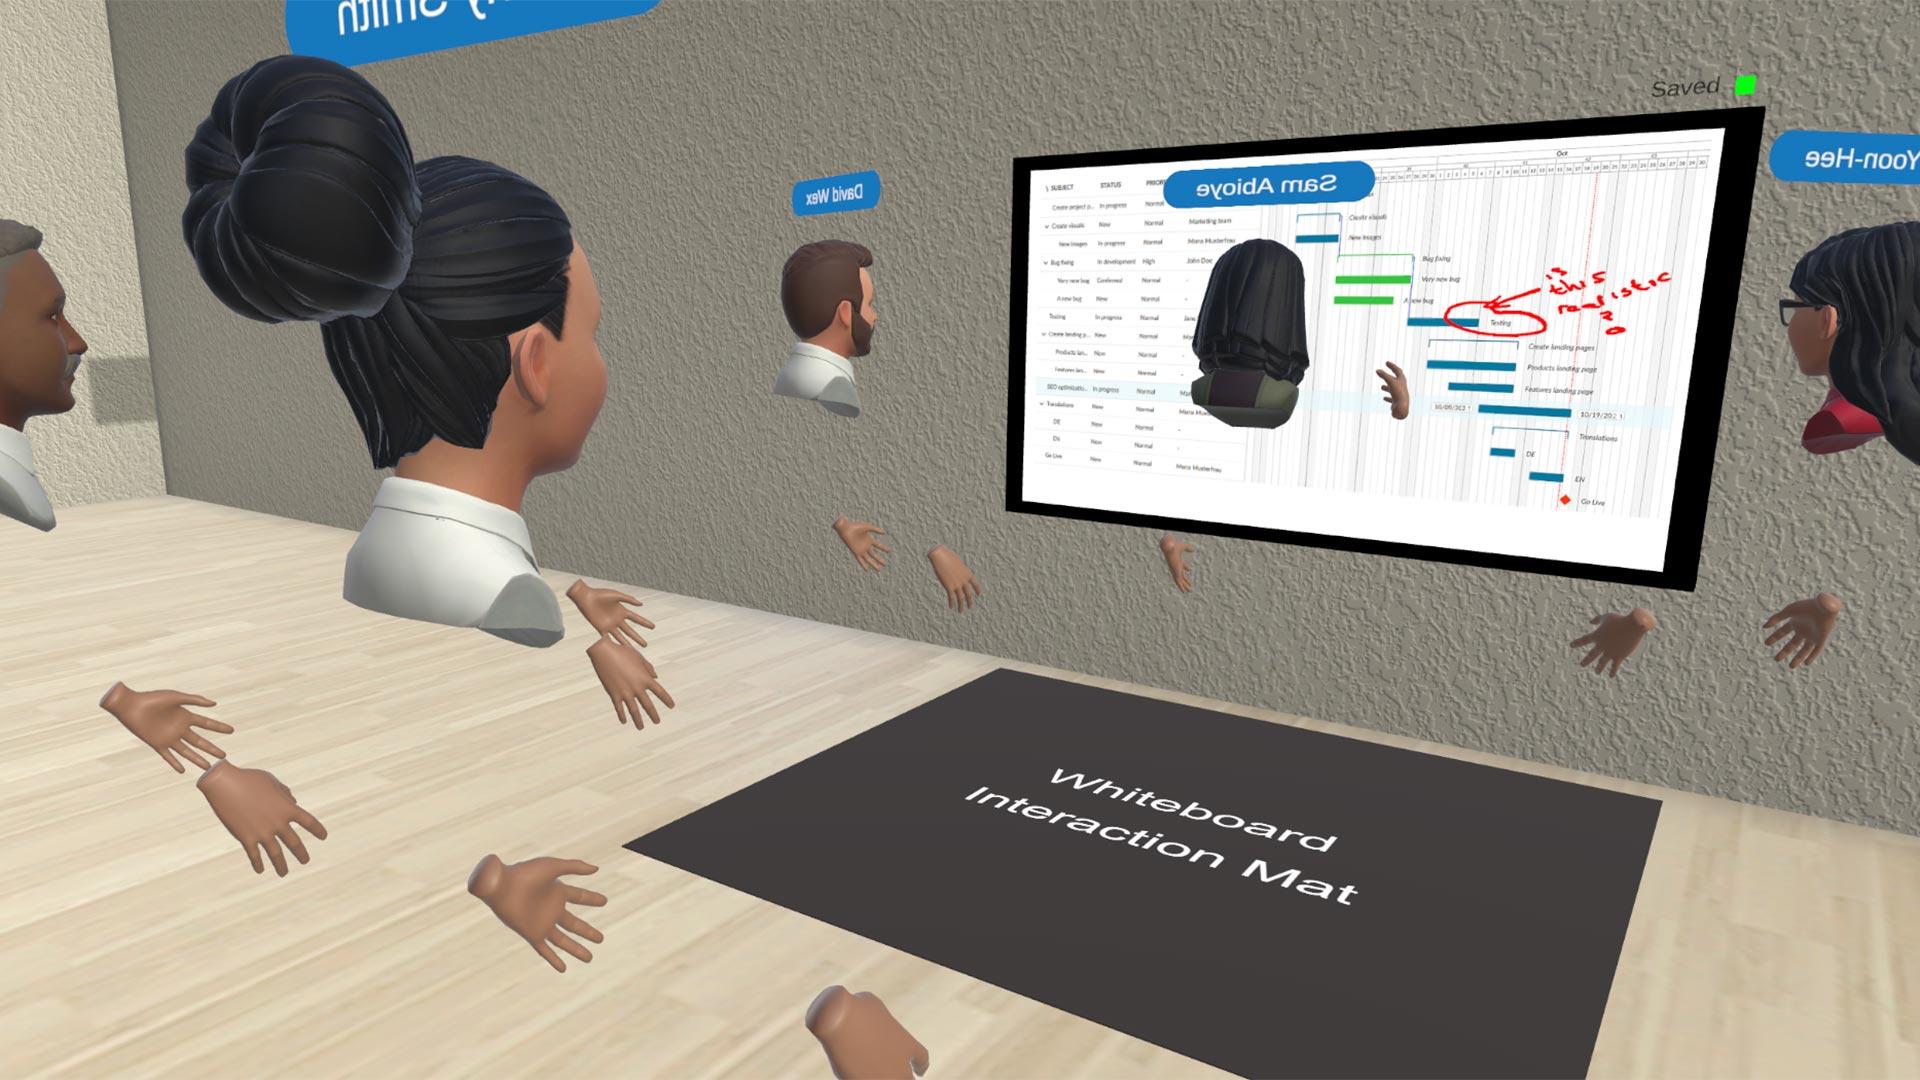 avatars standing around a whiteboard